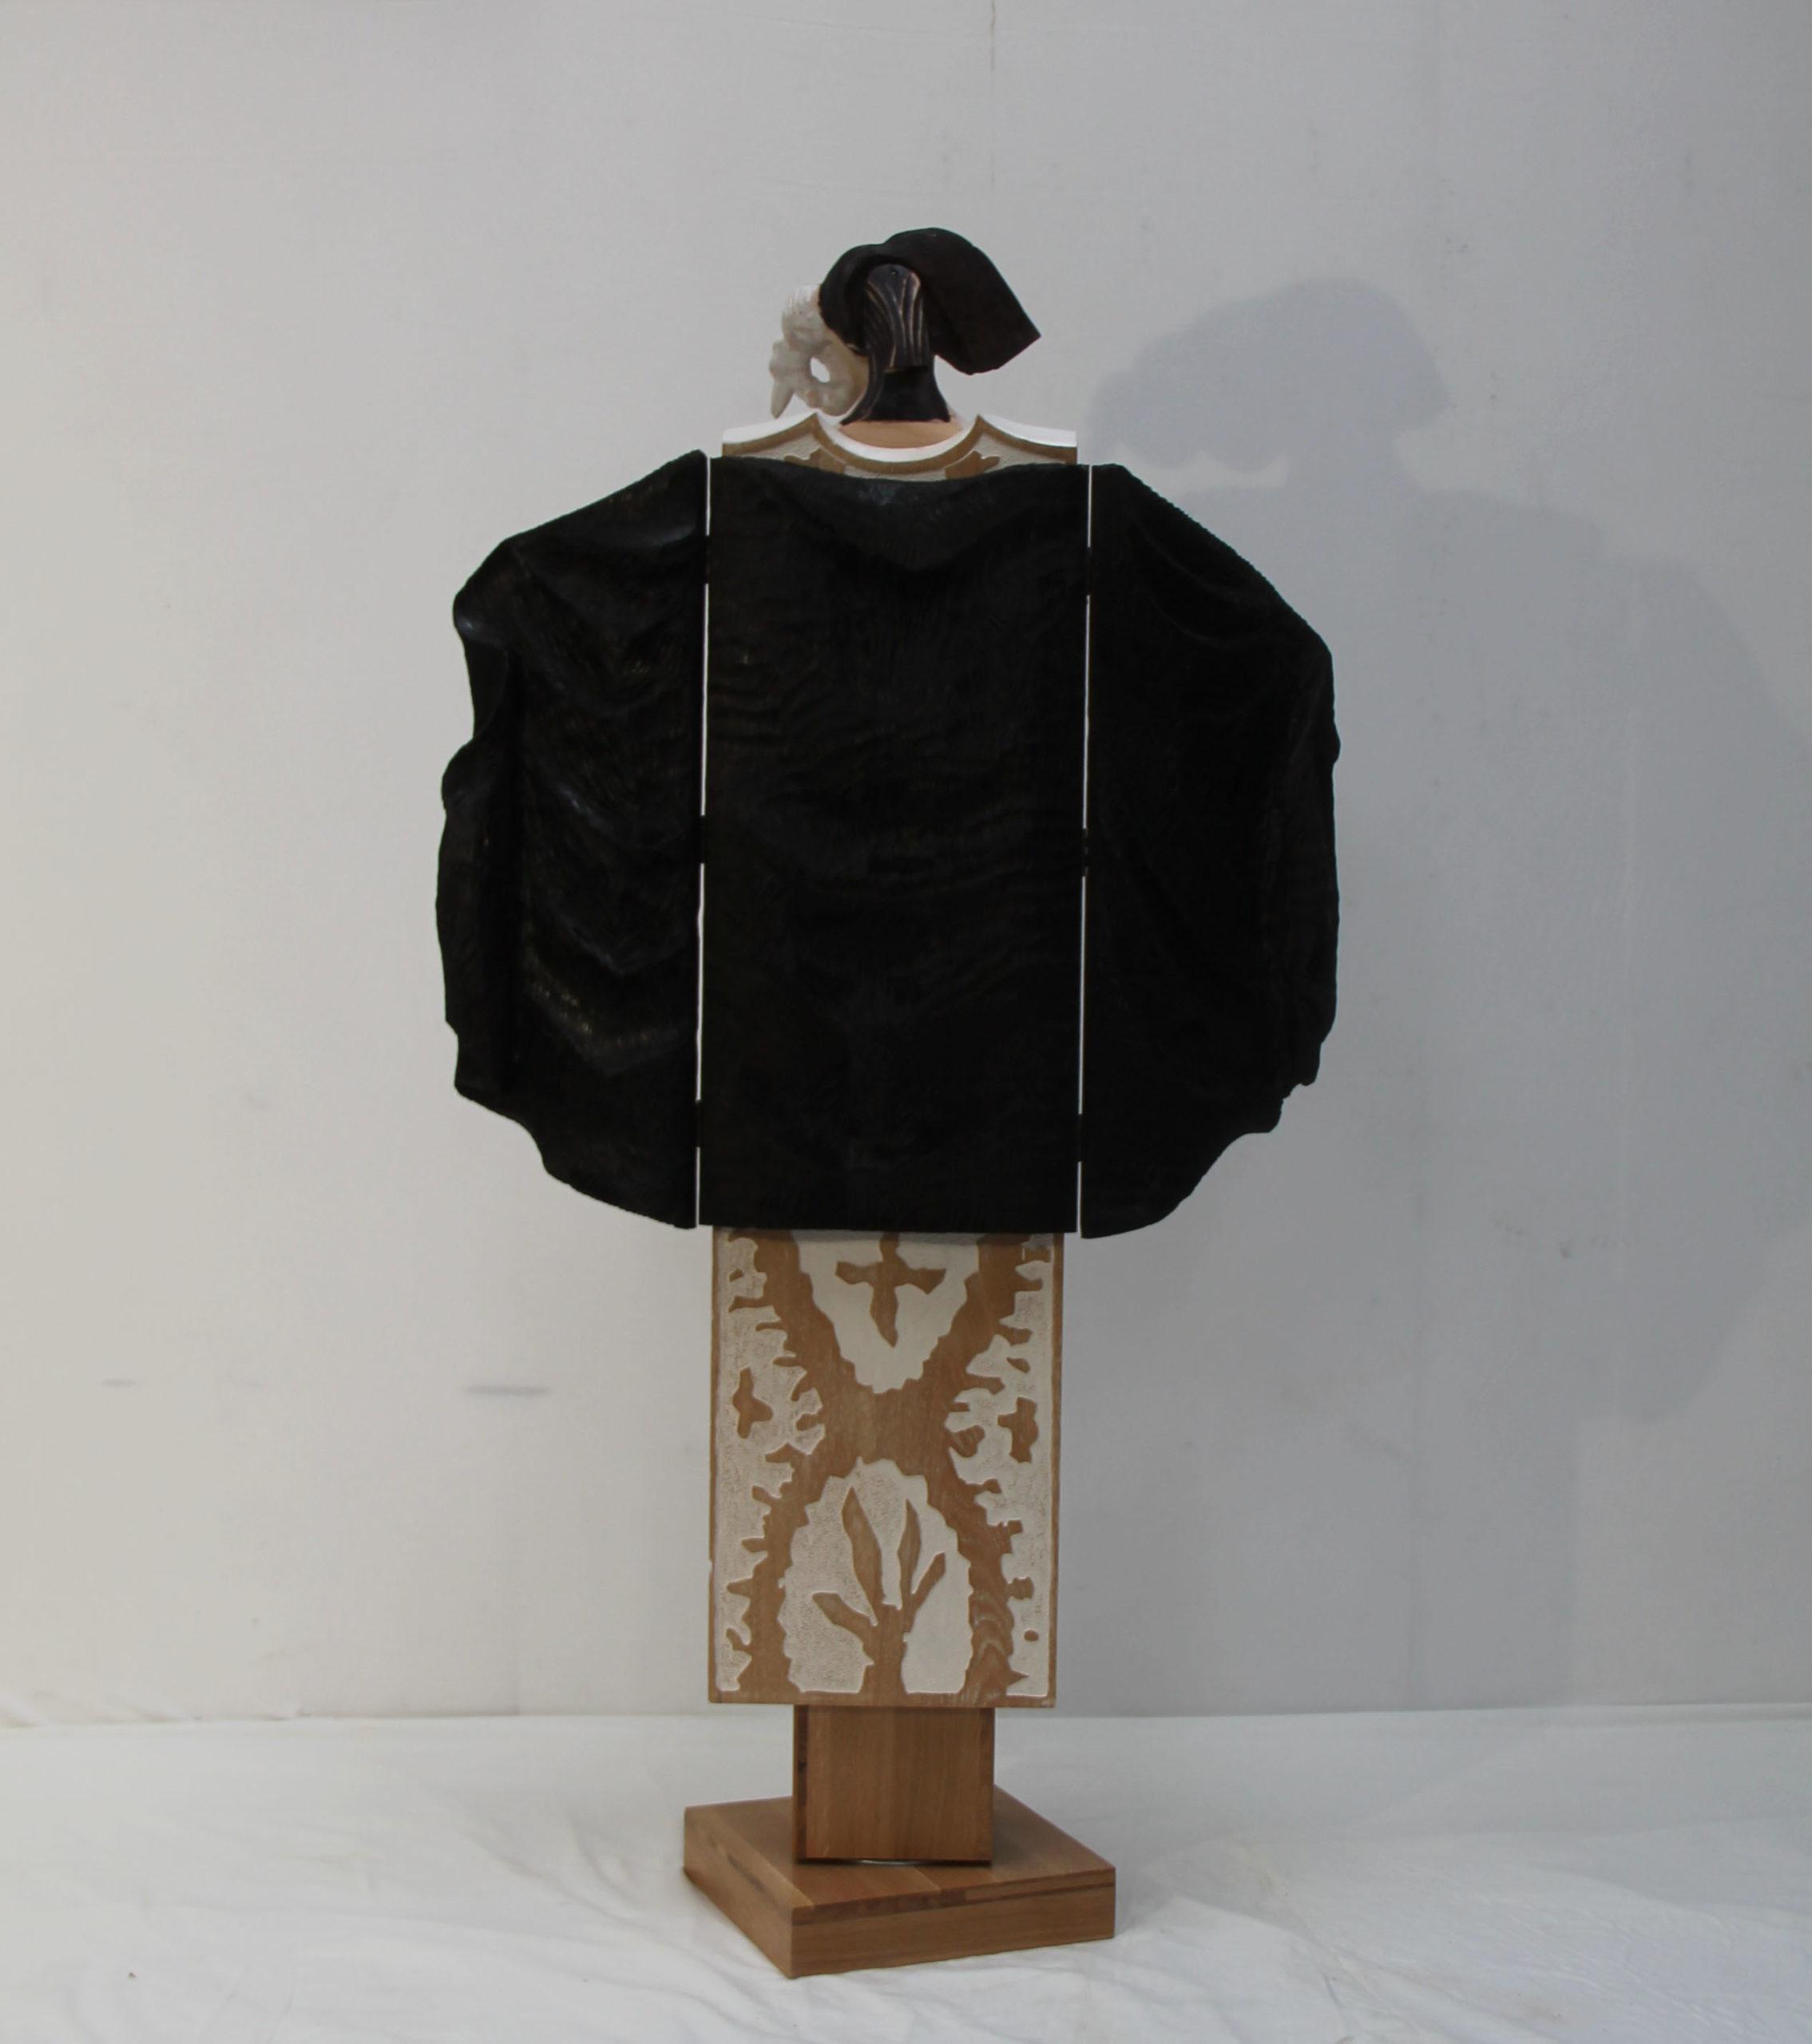 Chêne sculpté teinté 195 x 60 x 30 cm